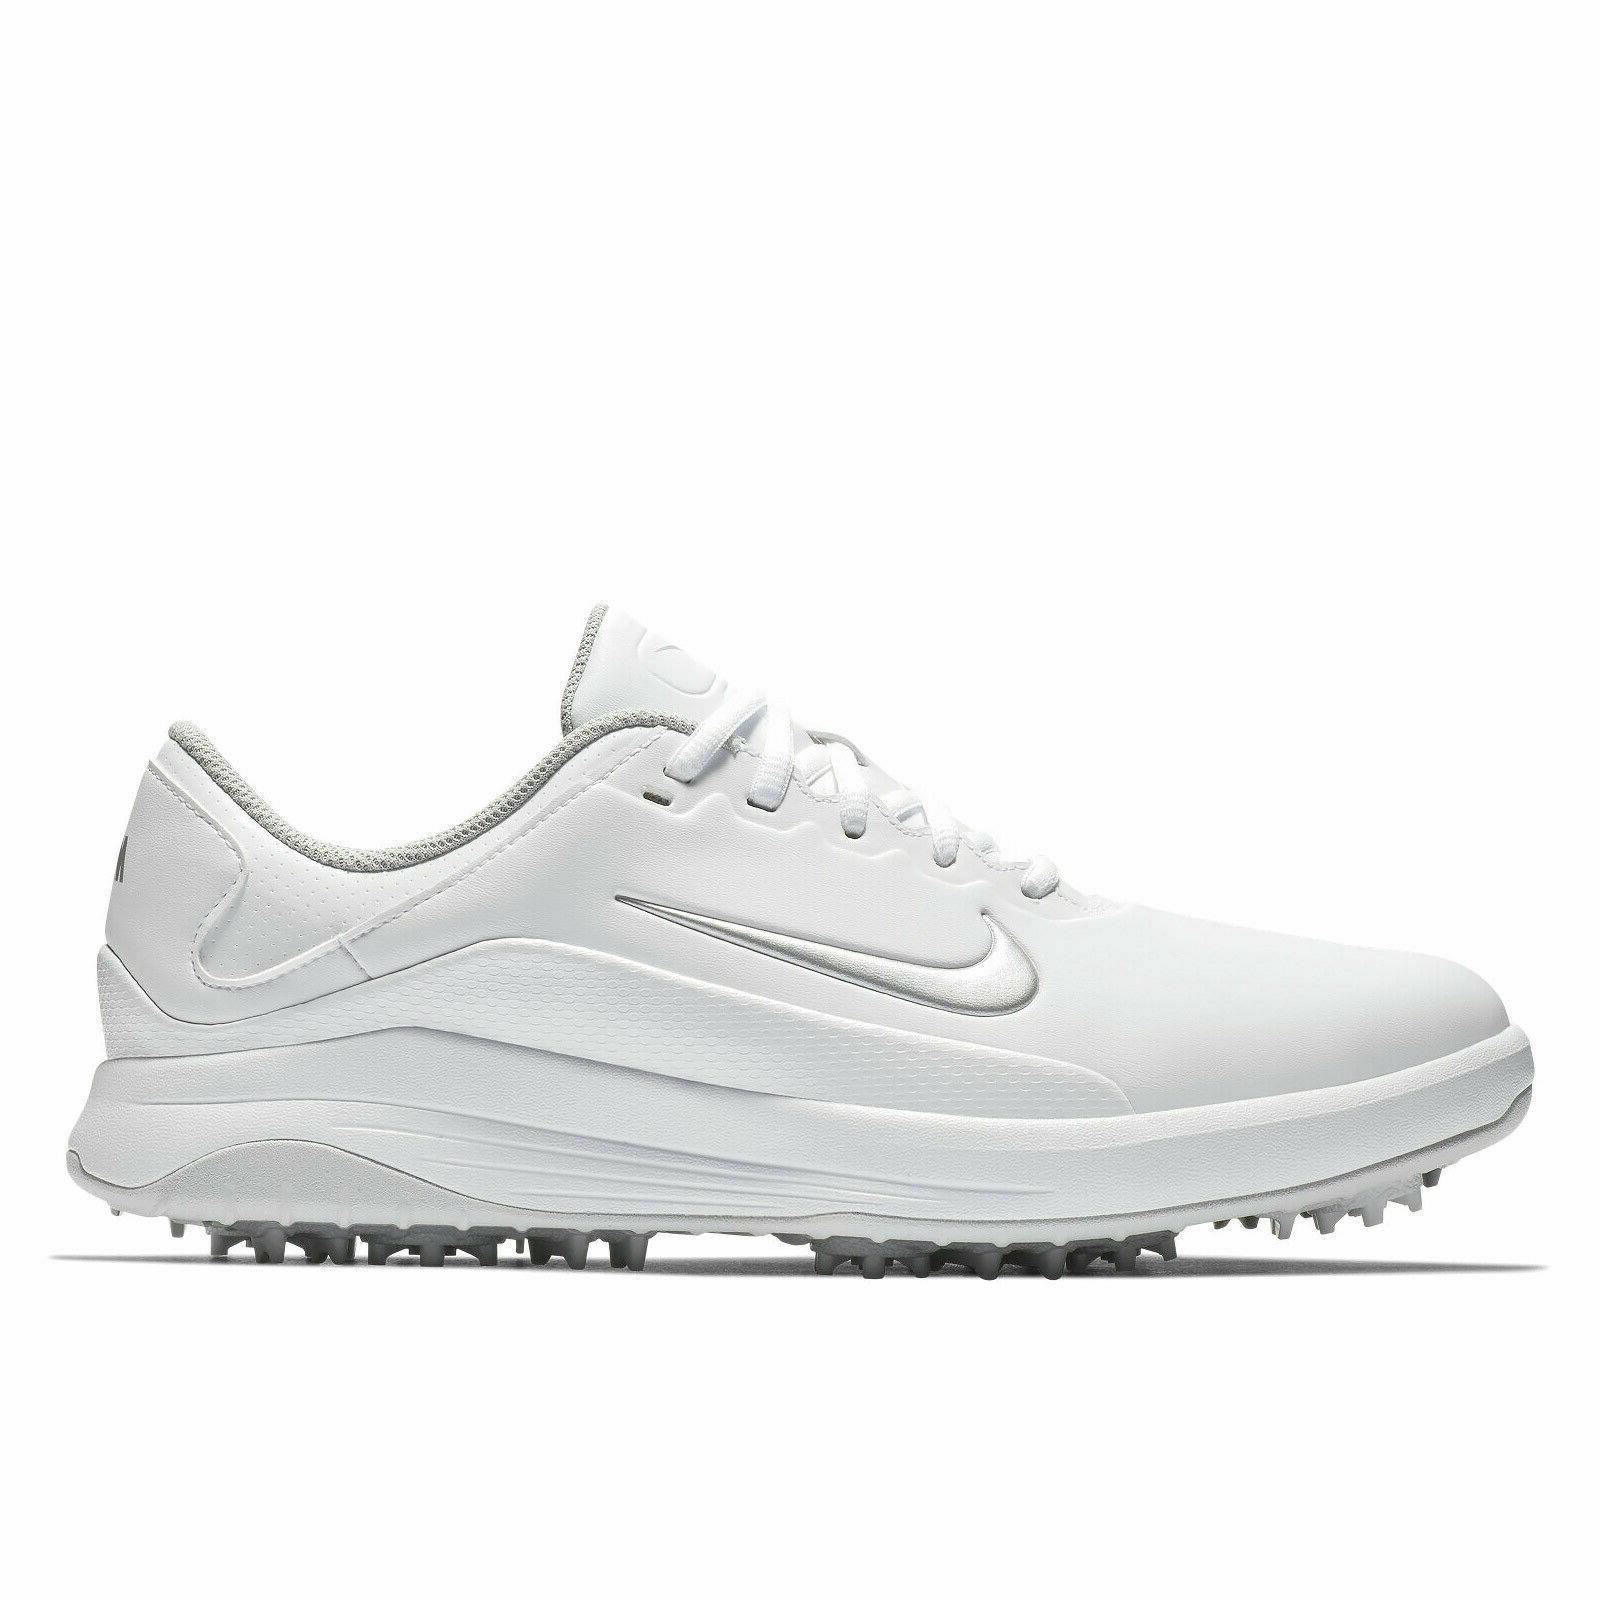 mens vapor golf shoes cleats spikes wide